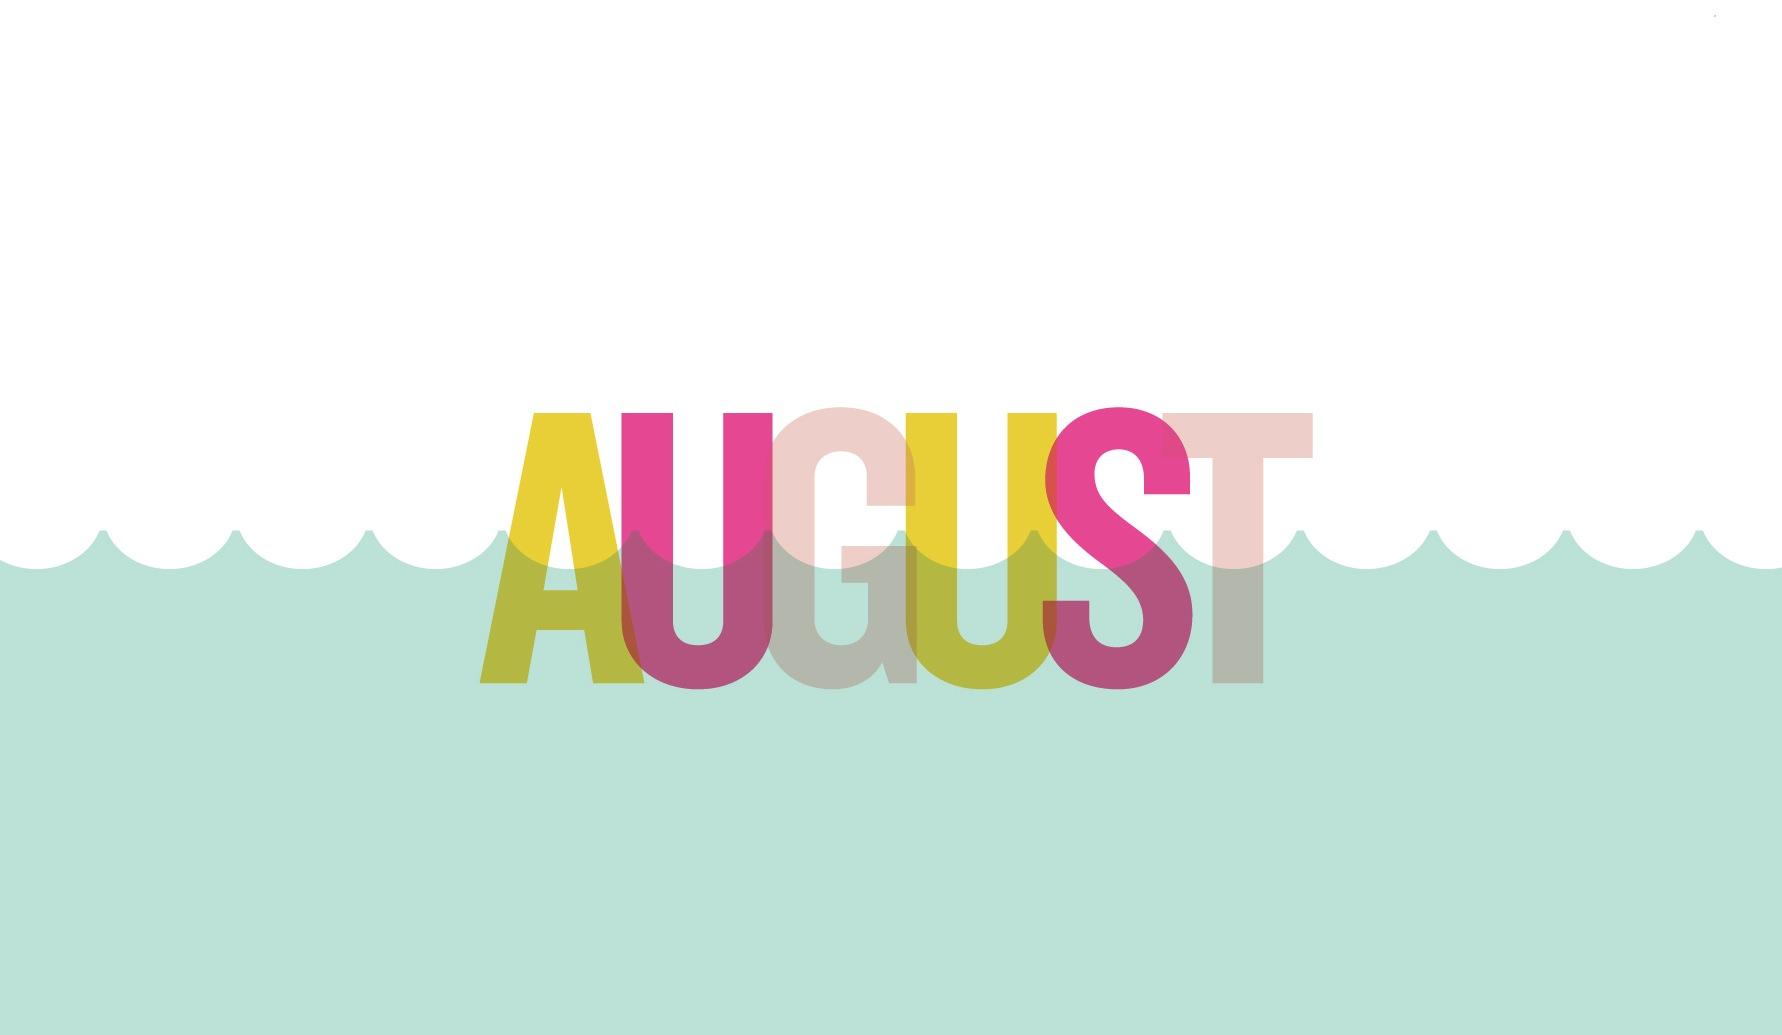 august - photo #10